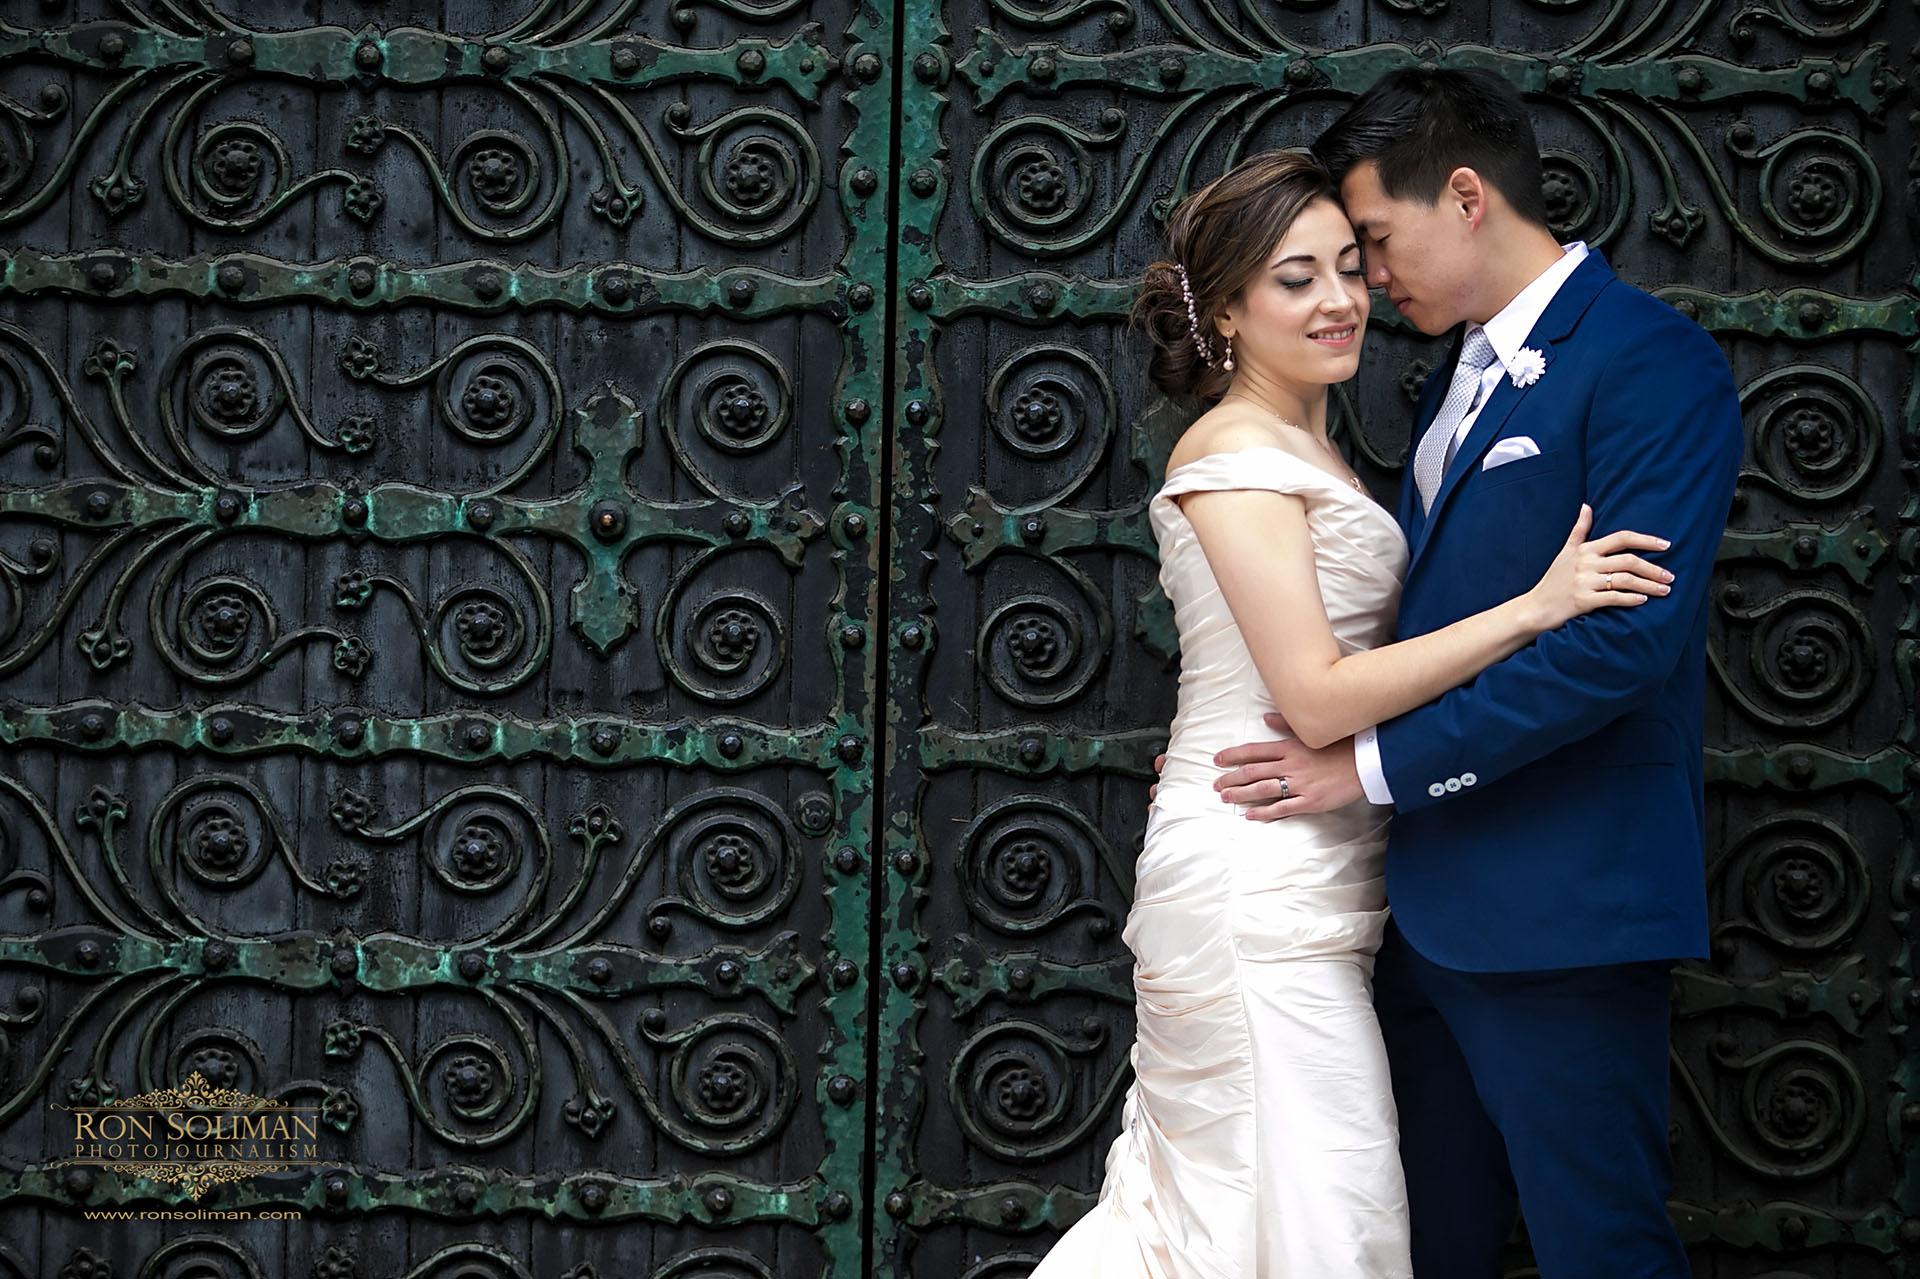 LIGHTHOUSE CHELSEA PIERS WEDDING 24